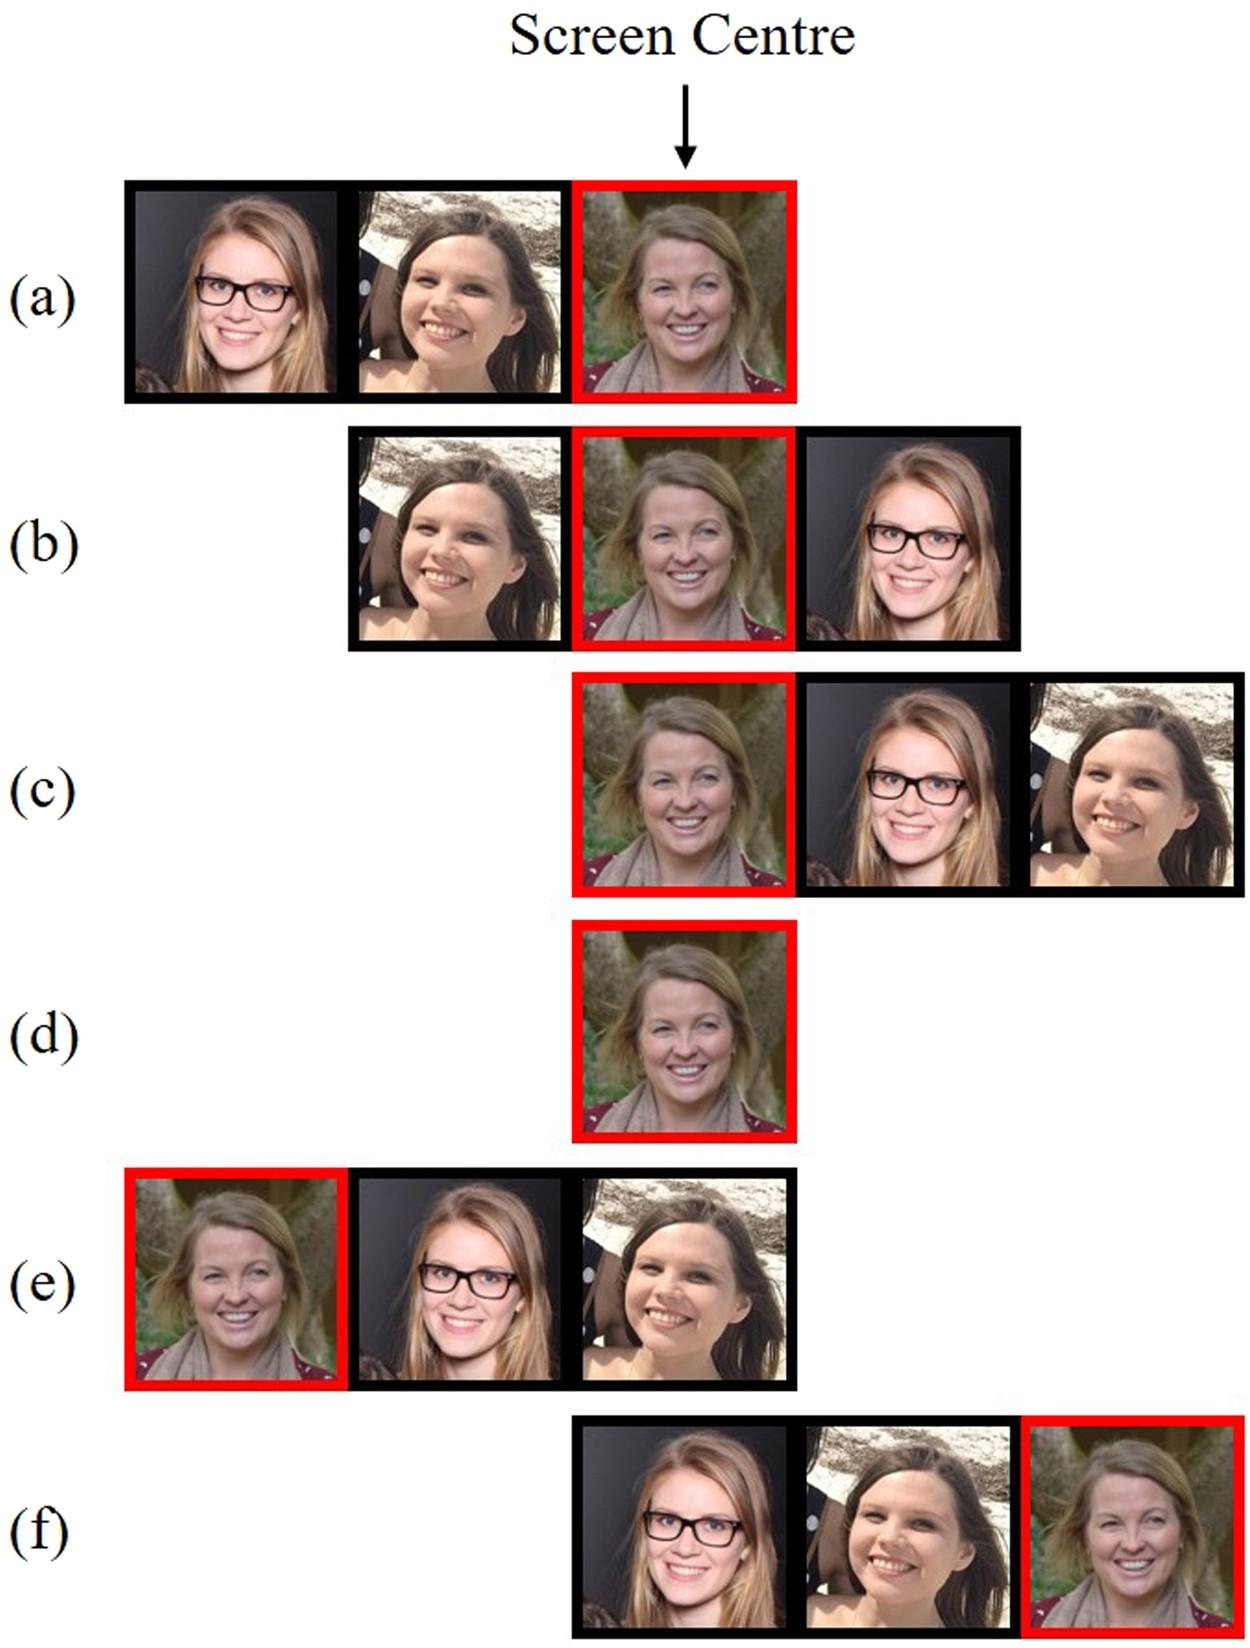 Visuospatial asymmetries do not modulate the cheerleader